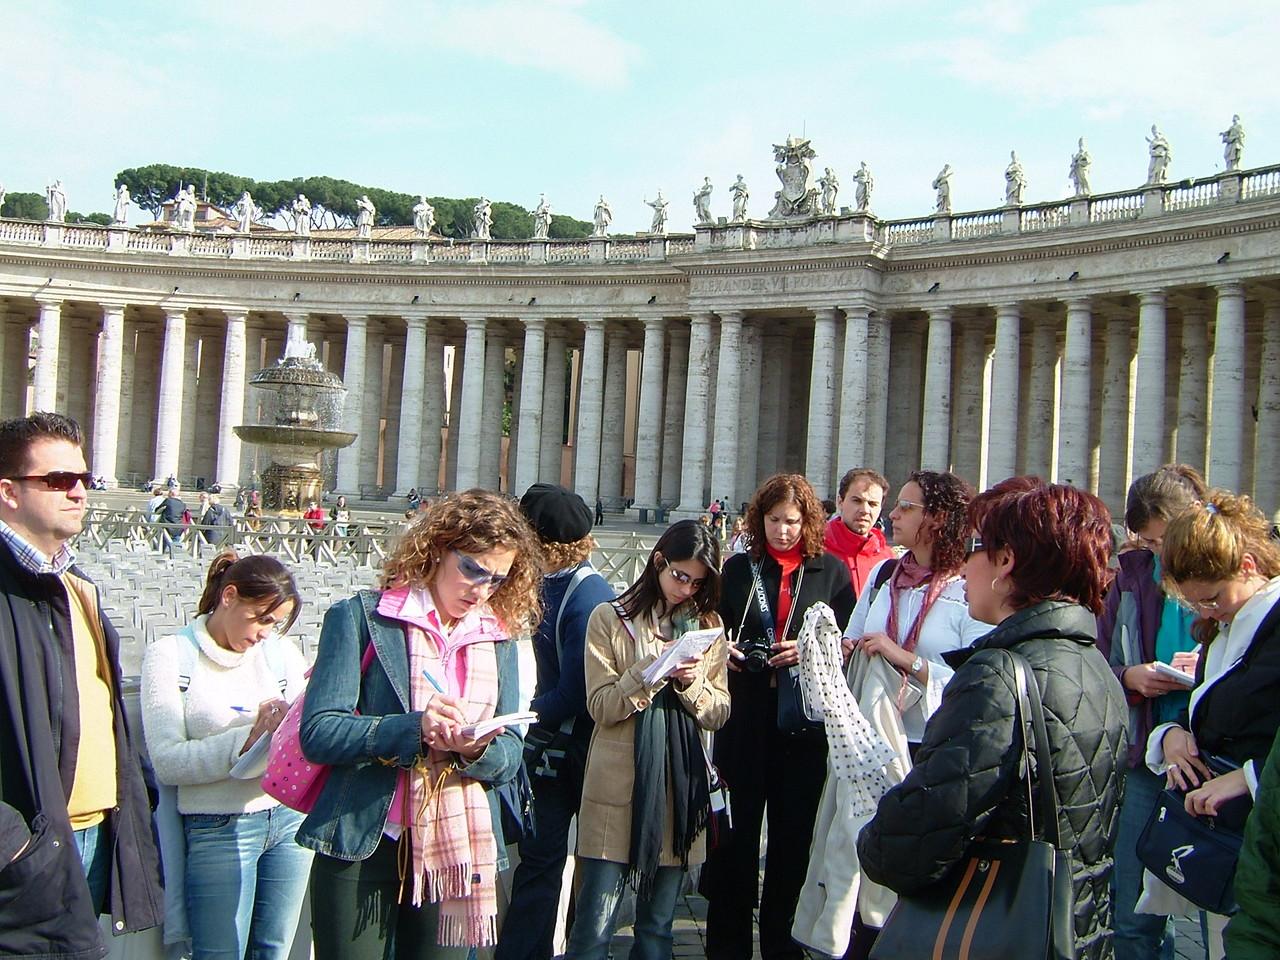 2003. Palza San Pedro. Roma